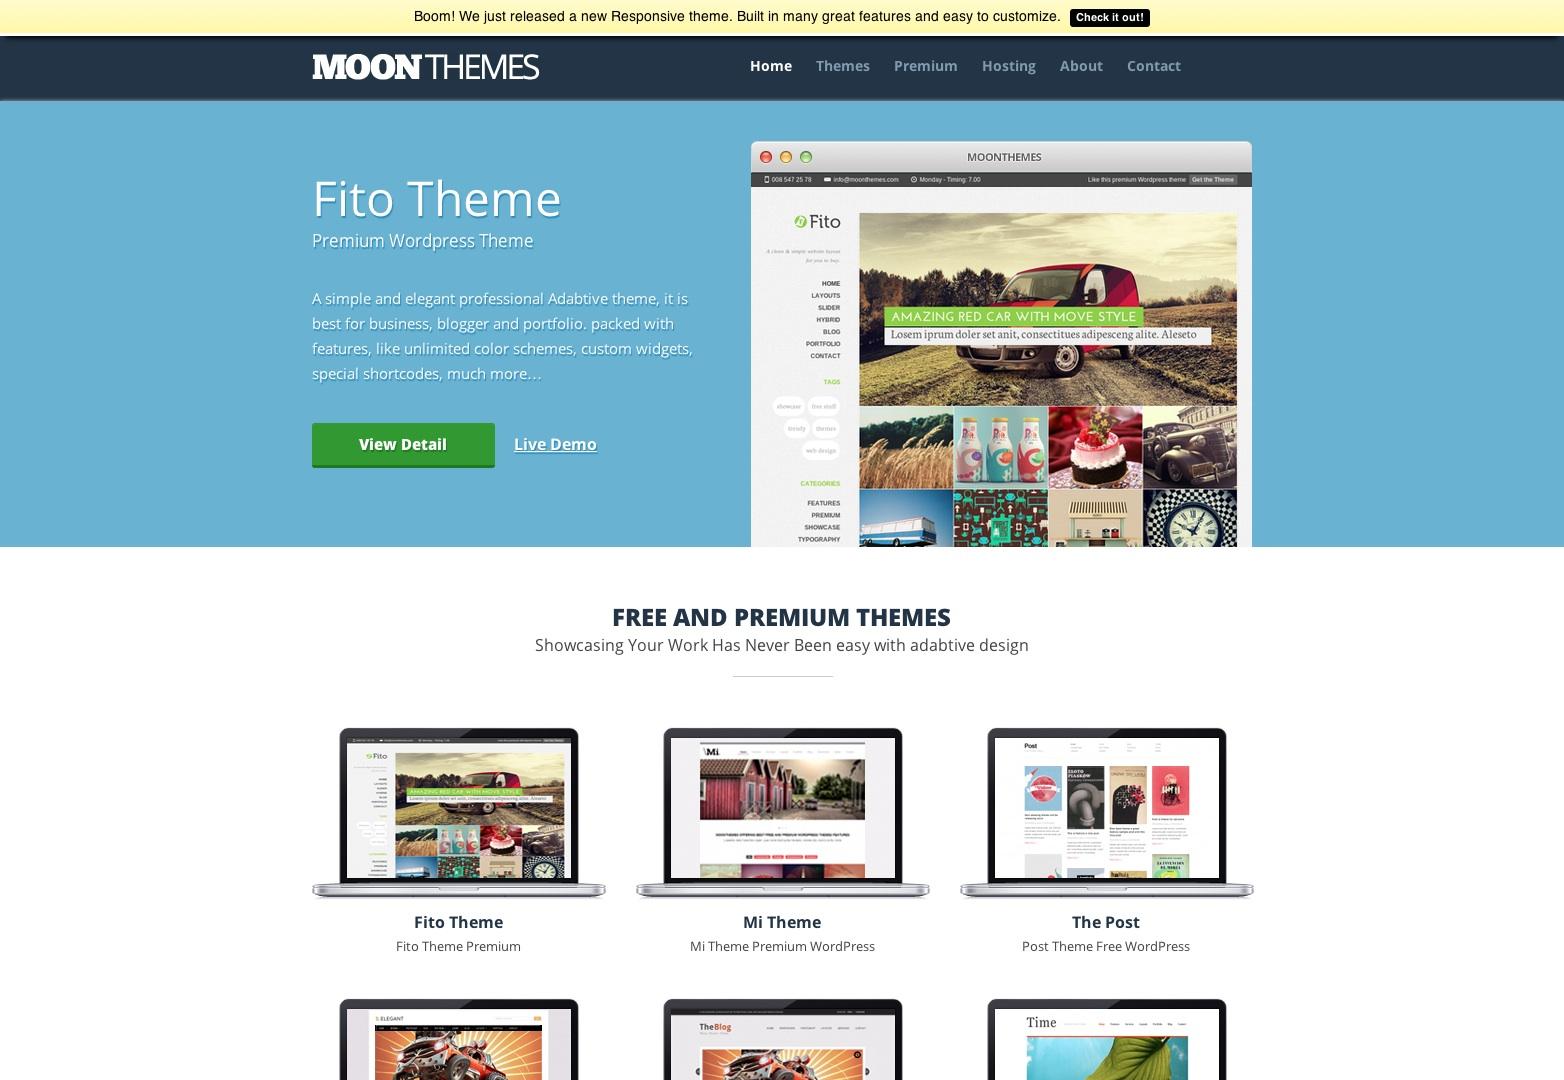 MOONTHEMES - Free Premium High Quality WordPress Themes